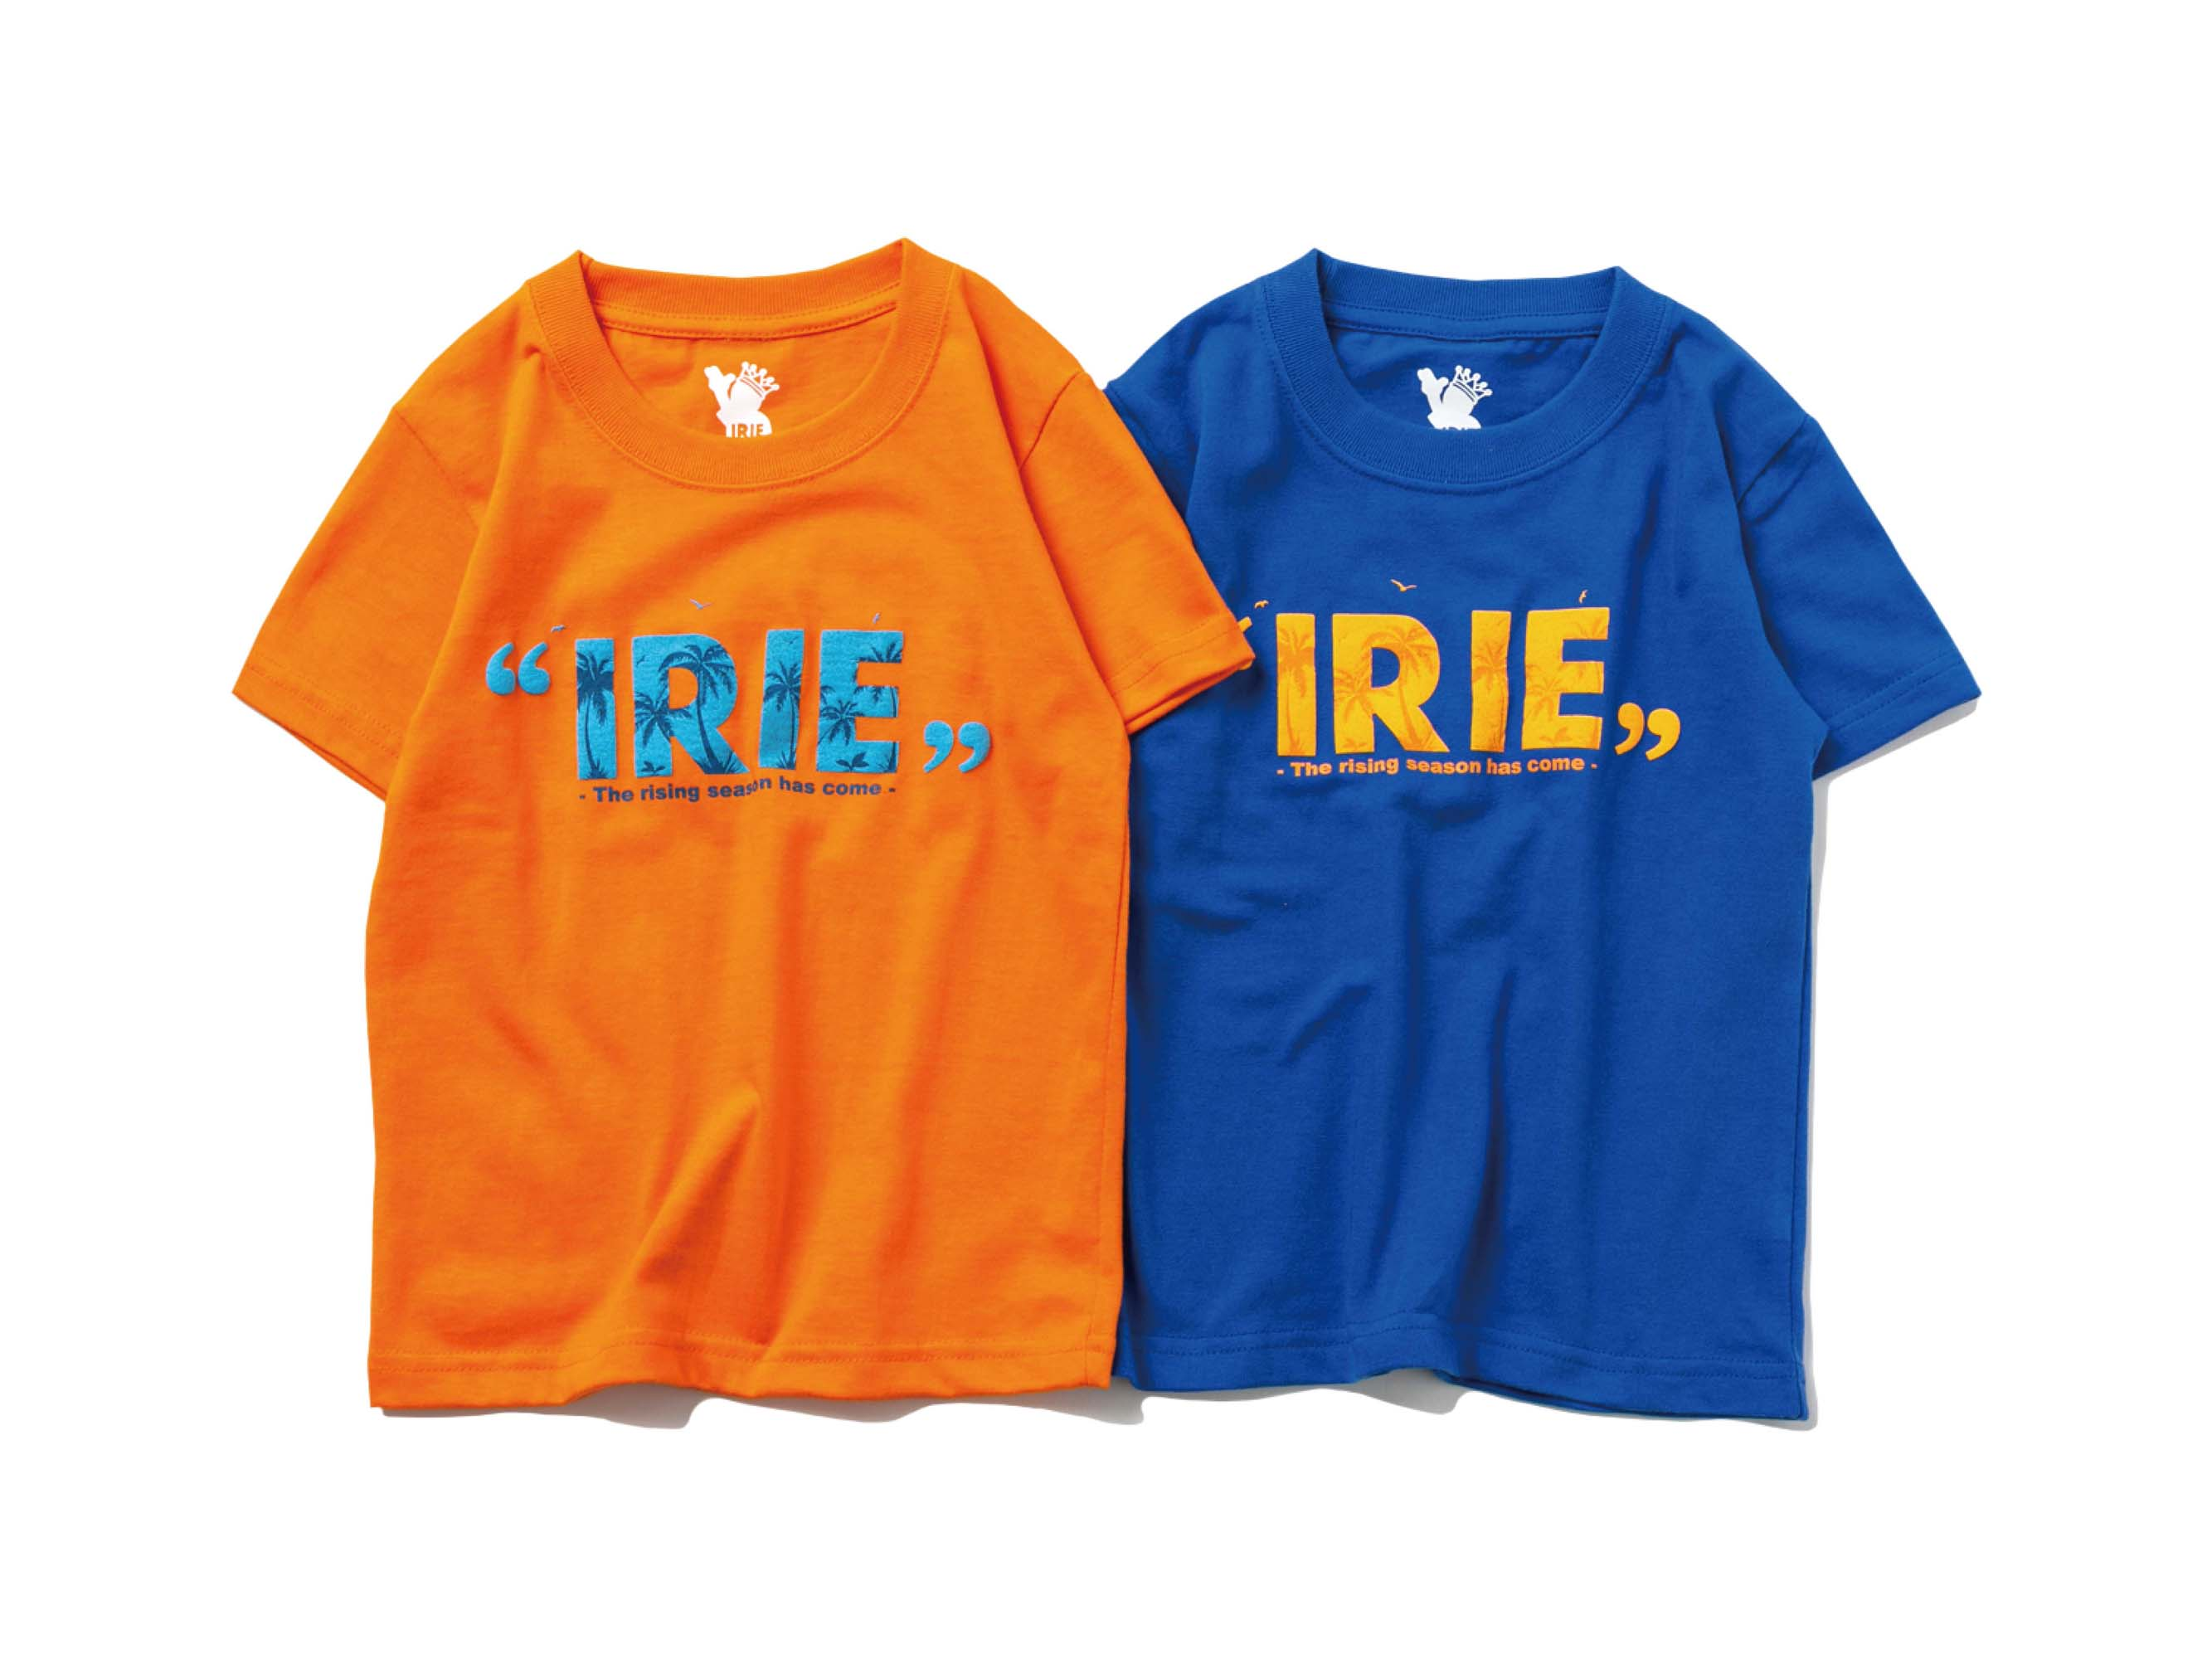 【20% OFF】IRIE SESON KIDS TEE - IRIE KIDS